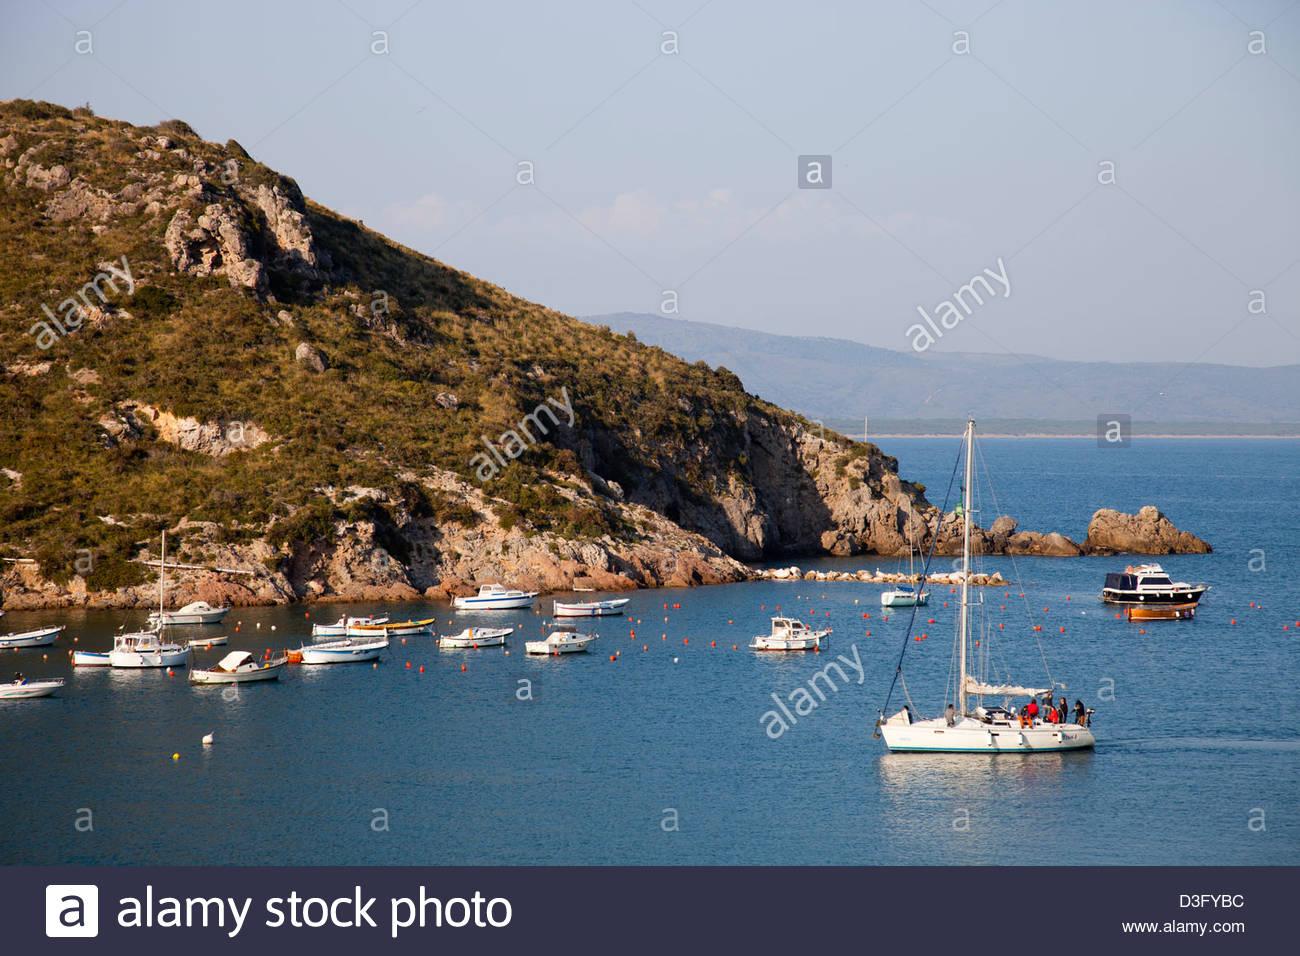 porto ercole,argentario peninsula,tuscany,italy - Stock Image